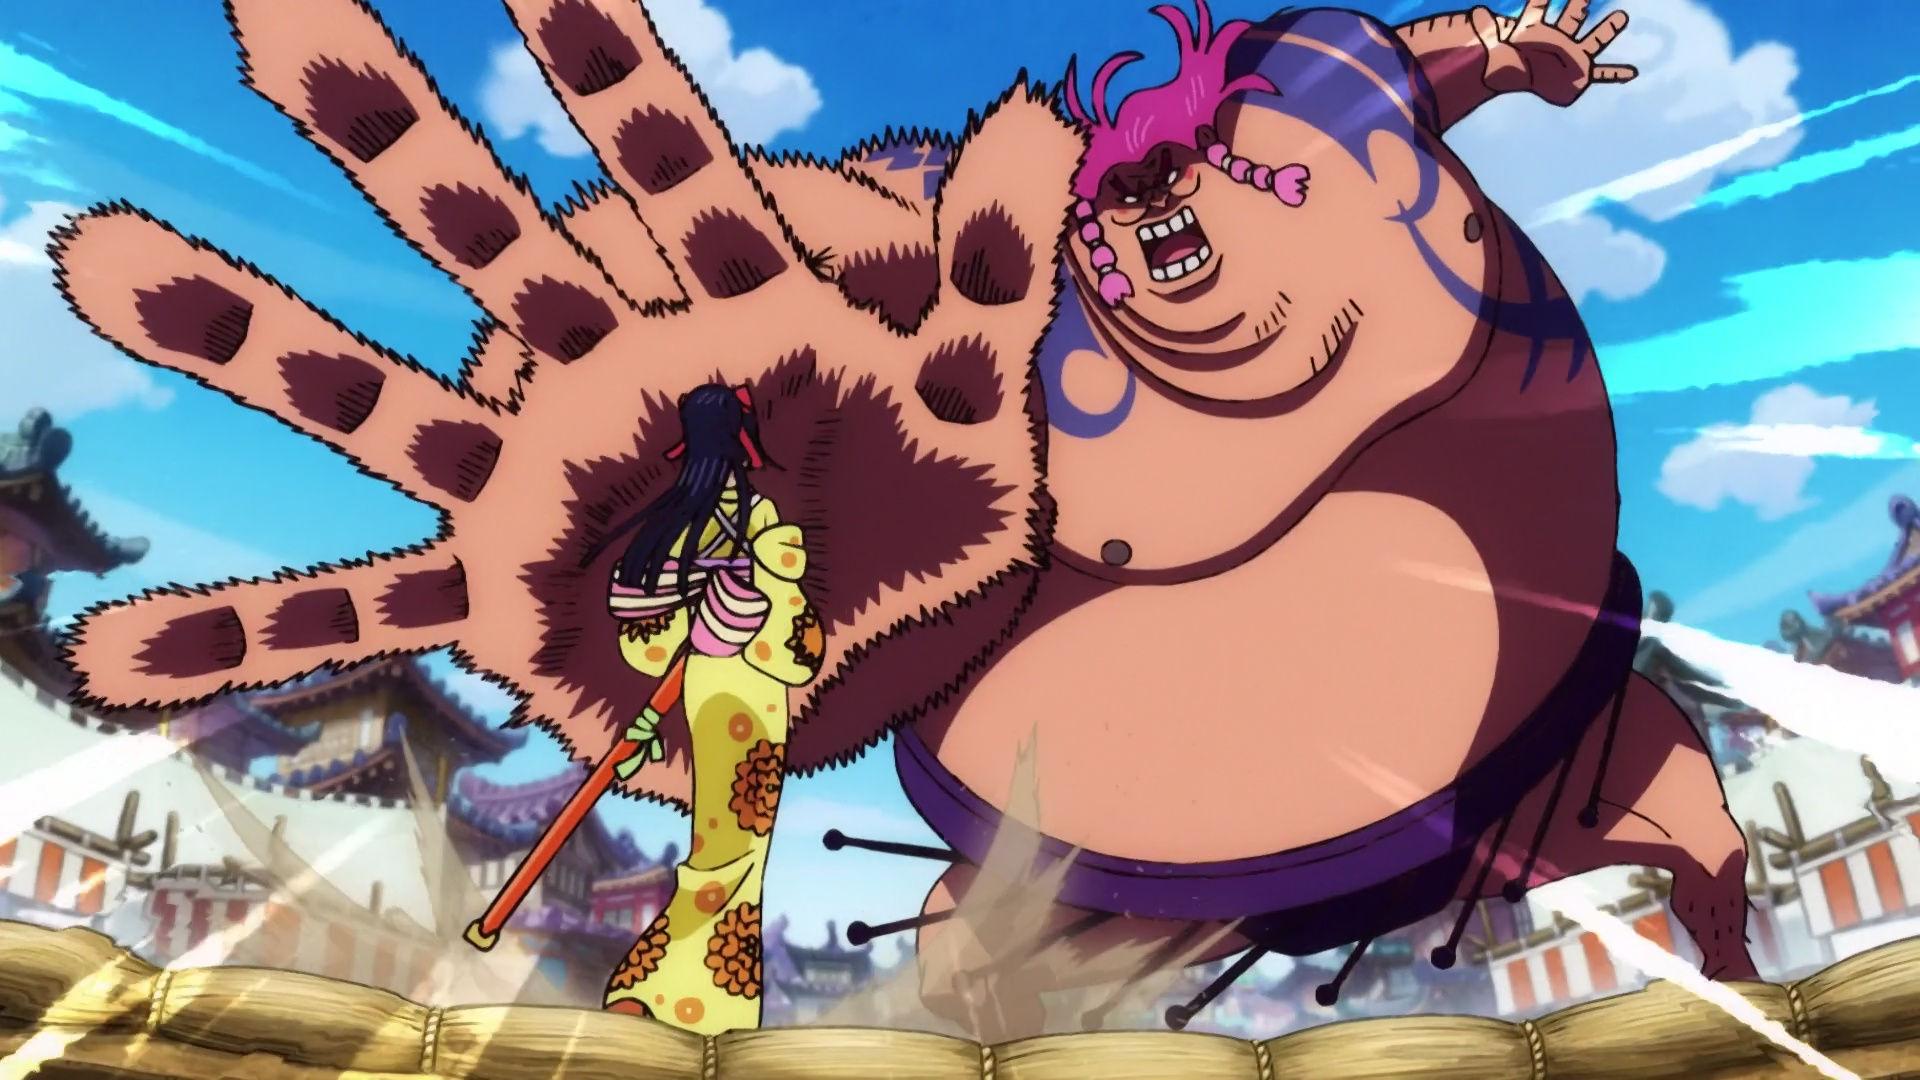 One Piece 903 VOSTFR SD/HD/HD 10BITS/FHD News background